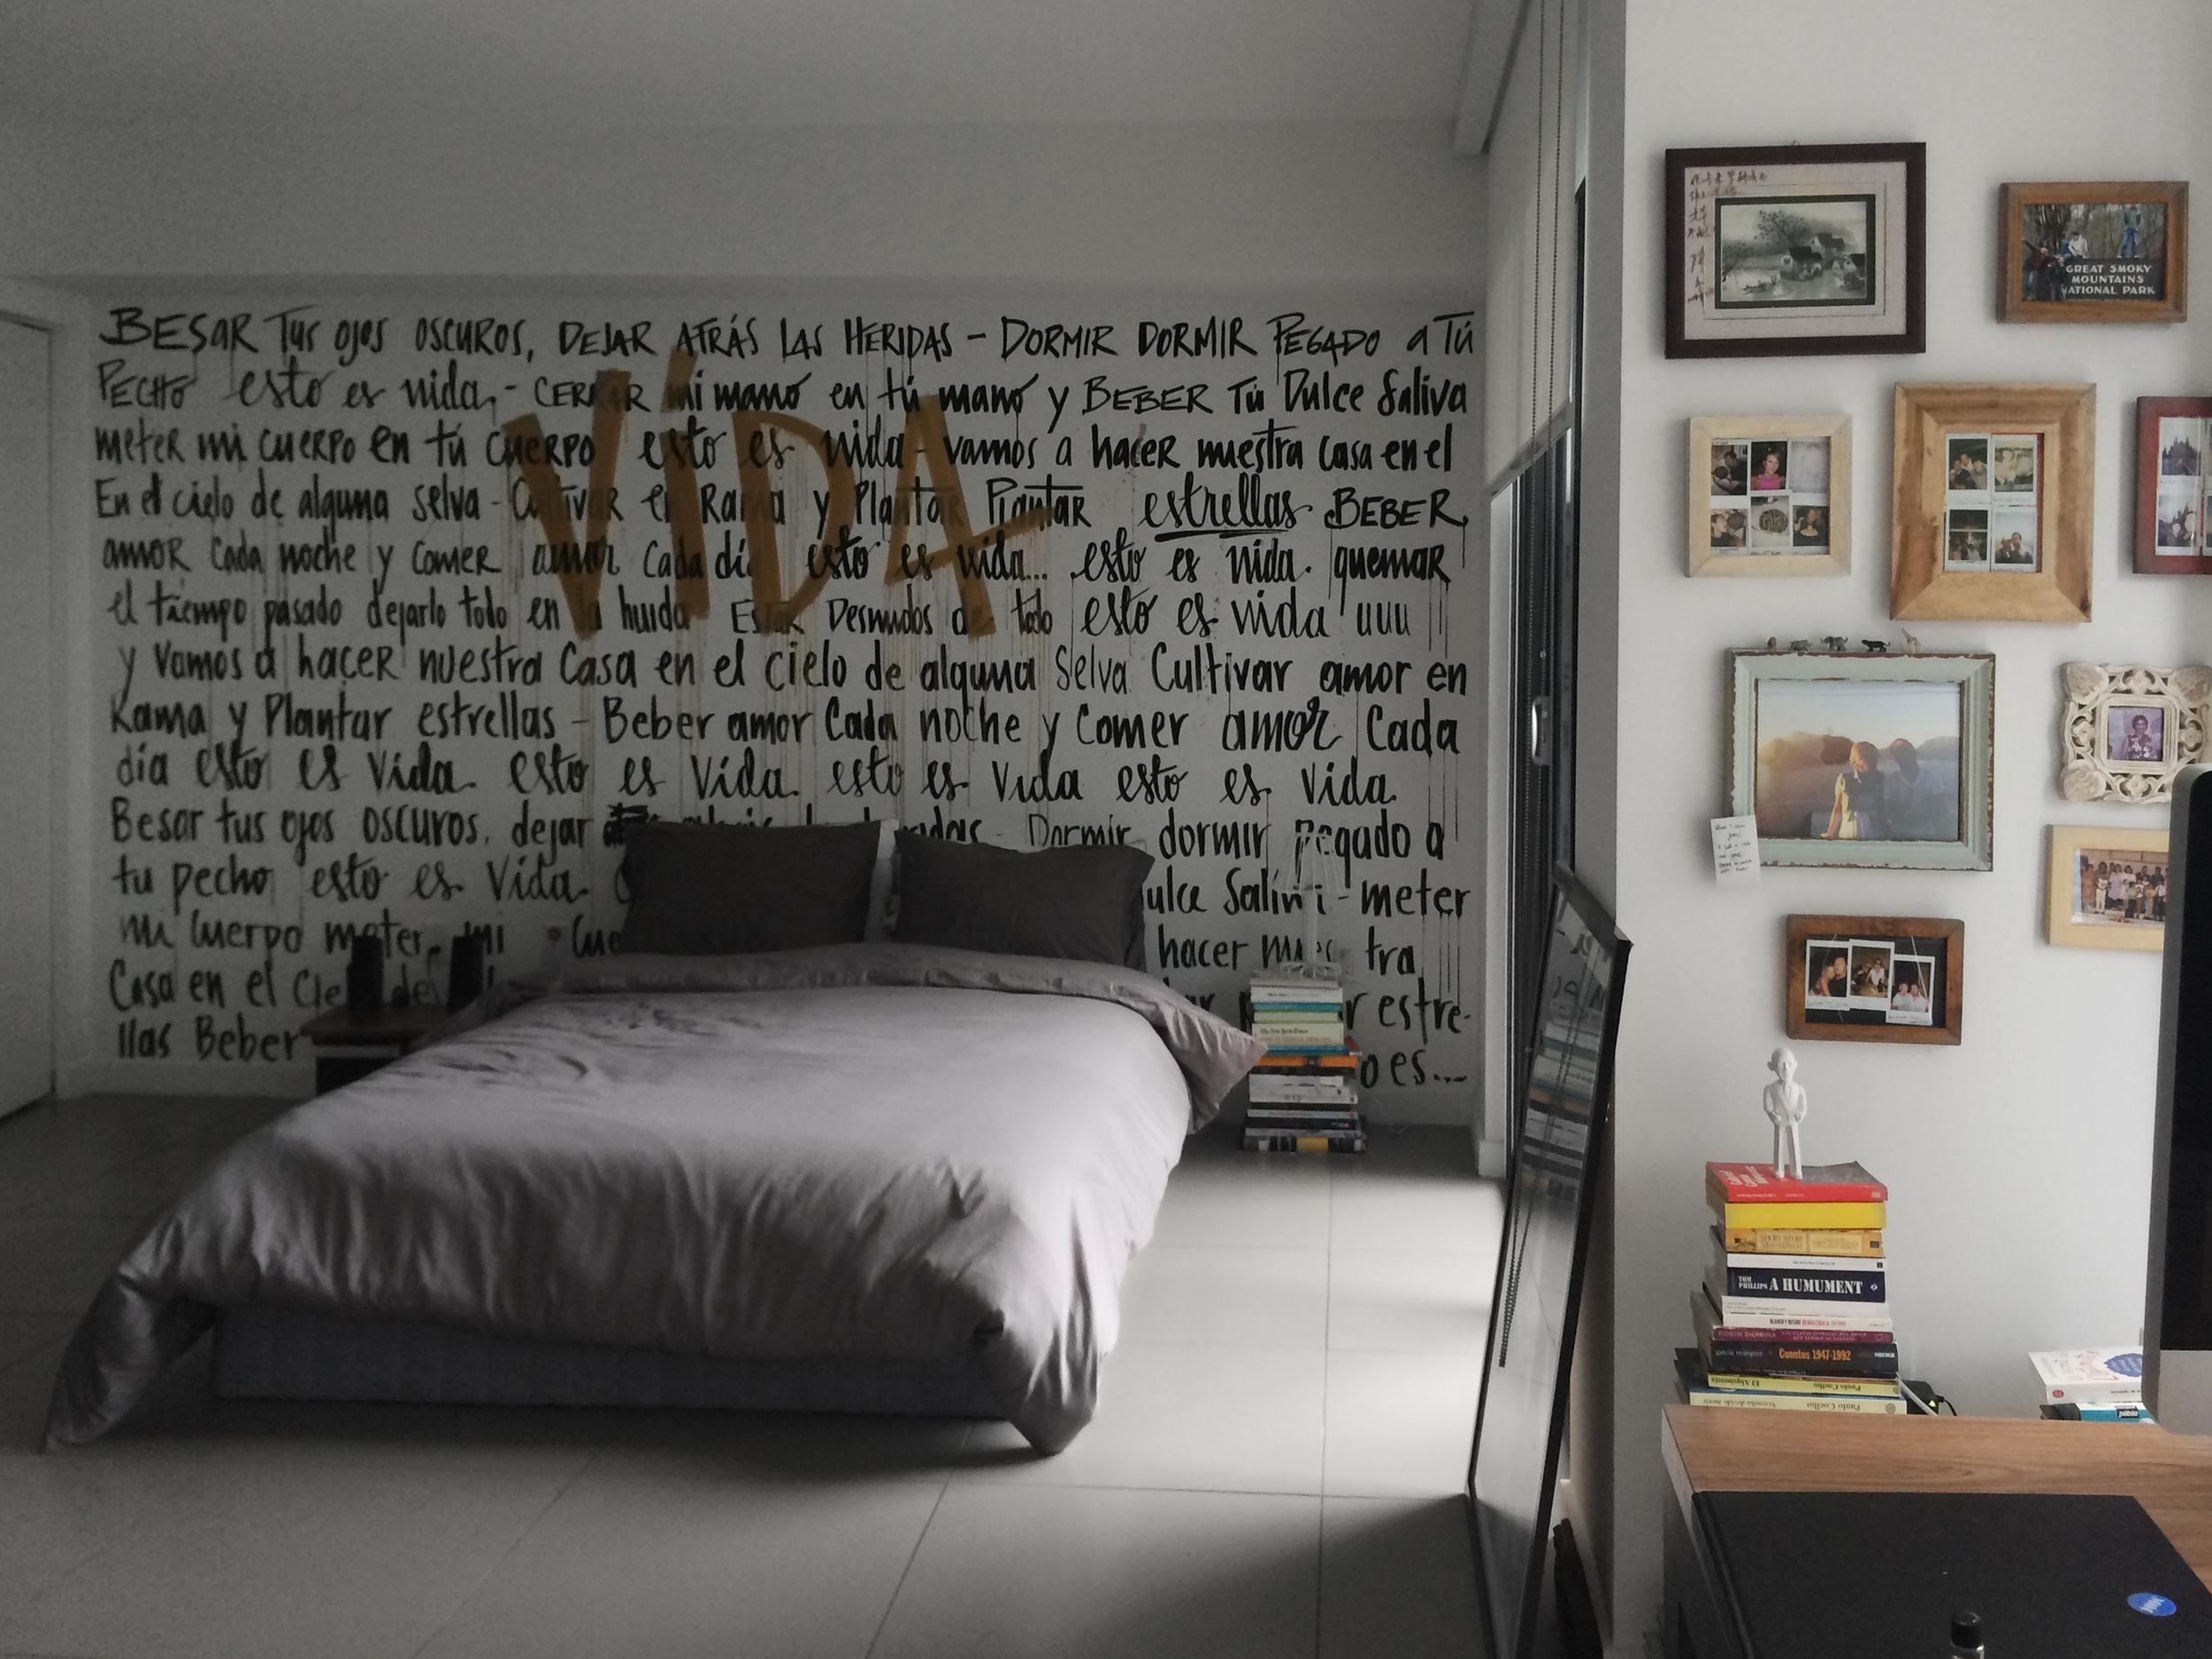 camilo-rojas-mural.jpg